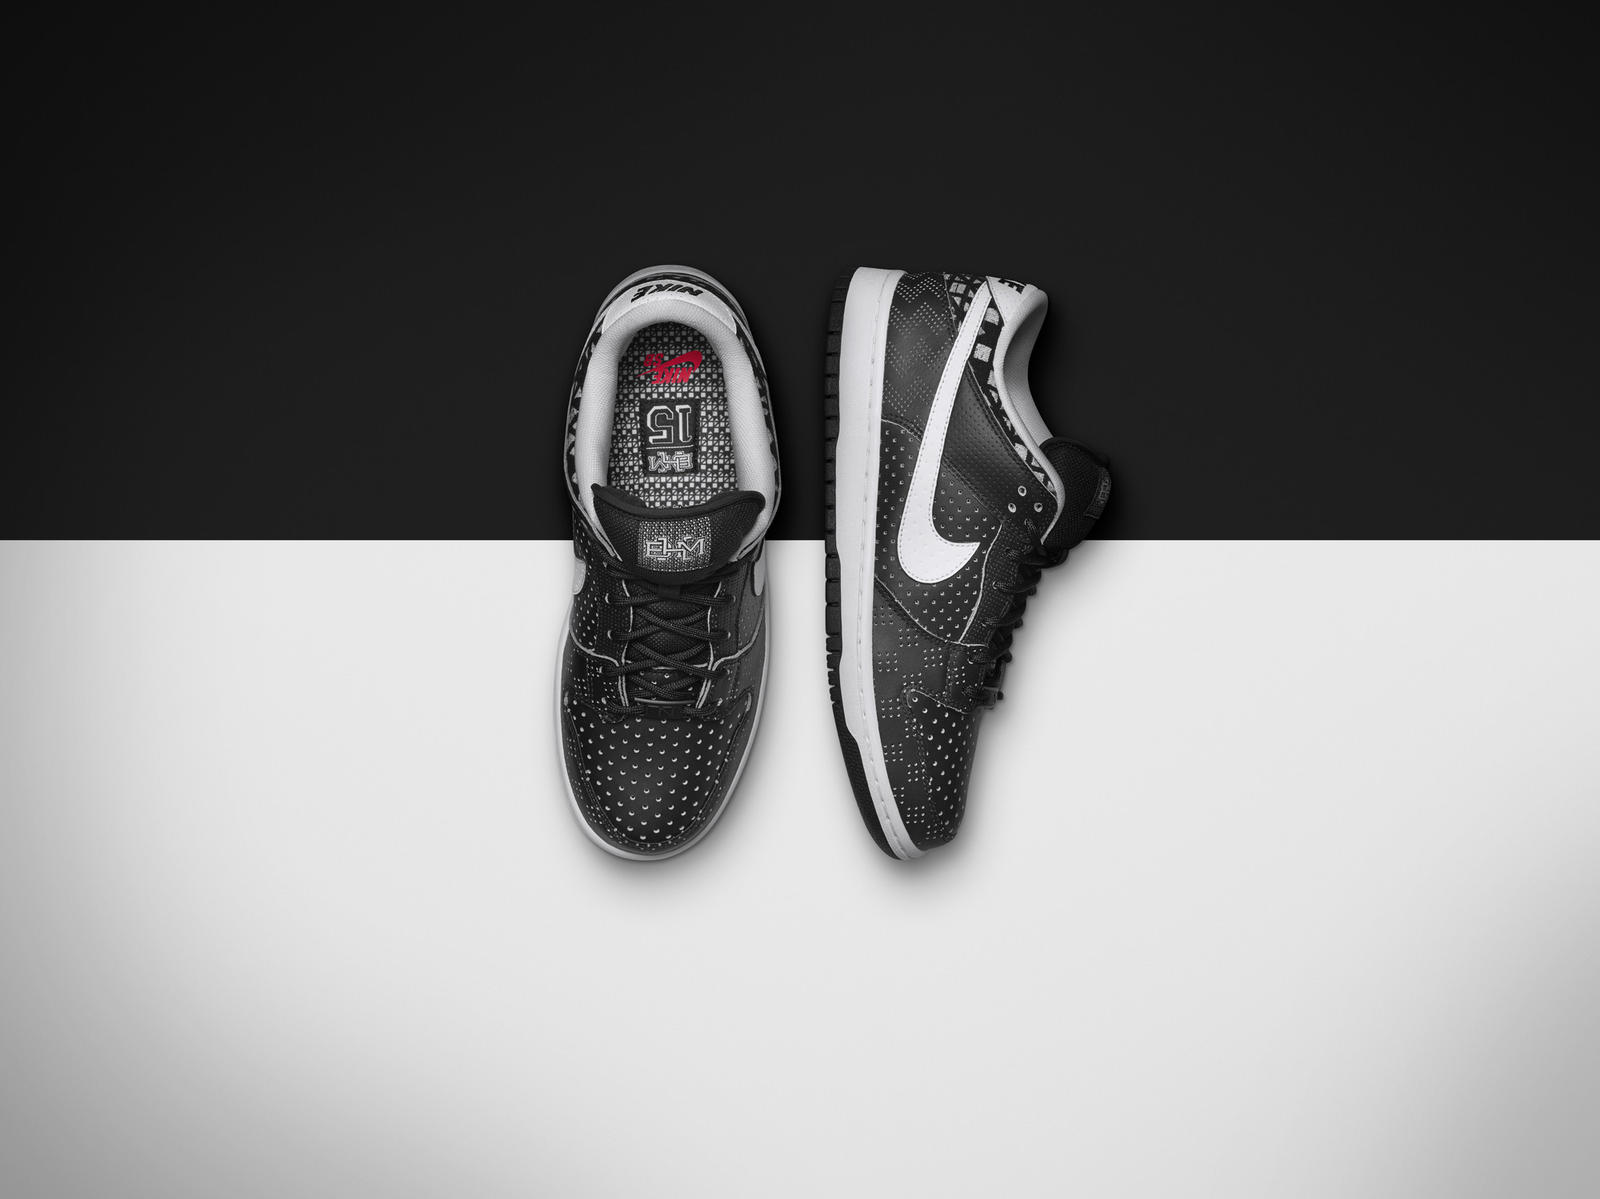 Nike_SP15_BHM_FTWR_SB_Final_native_1600